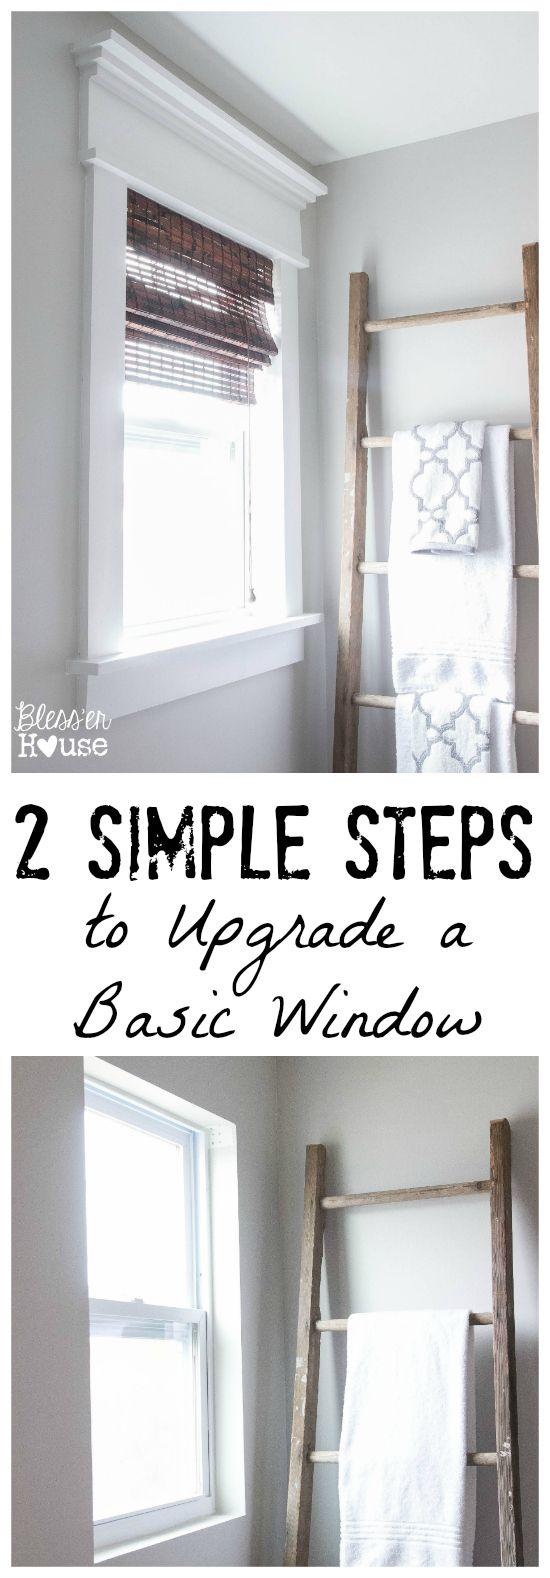 Kitchen window ledge   simple steps to upgrade a basic window  window master bathrooms